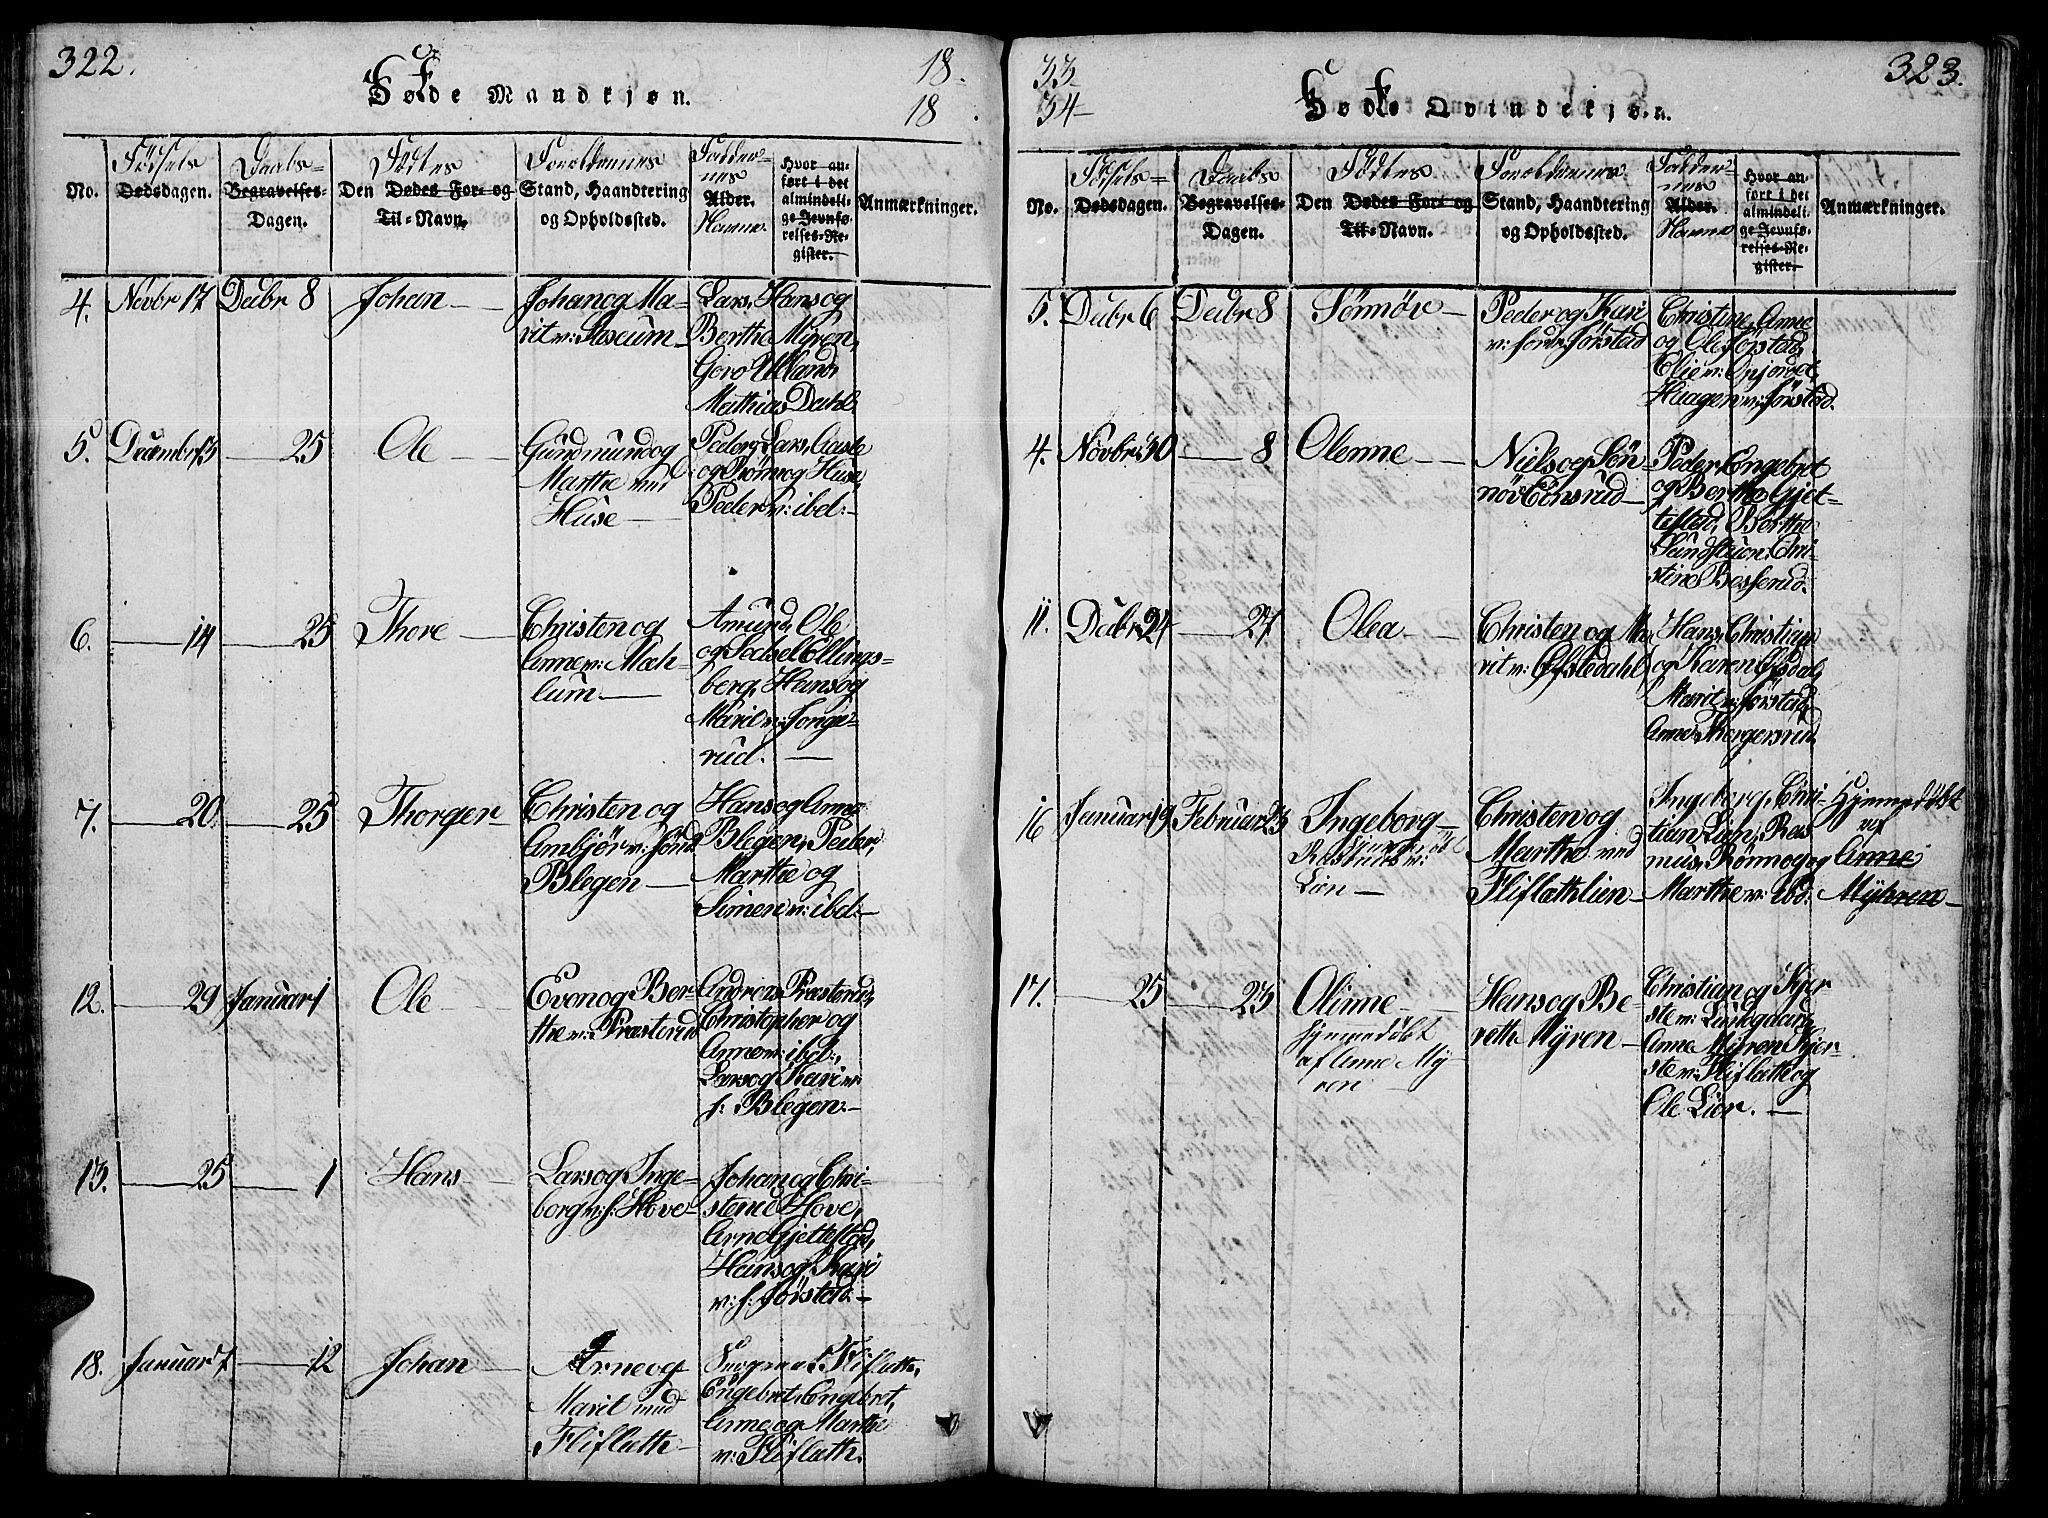 SAH, Fåberg prestekontor, Klokkerbok nr. 4, 1818-1837, s. 322-323